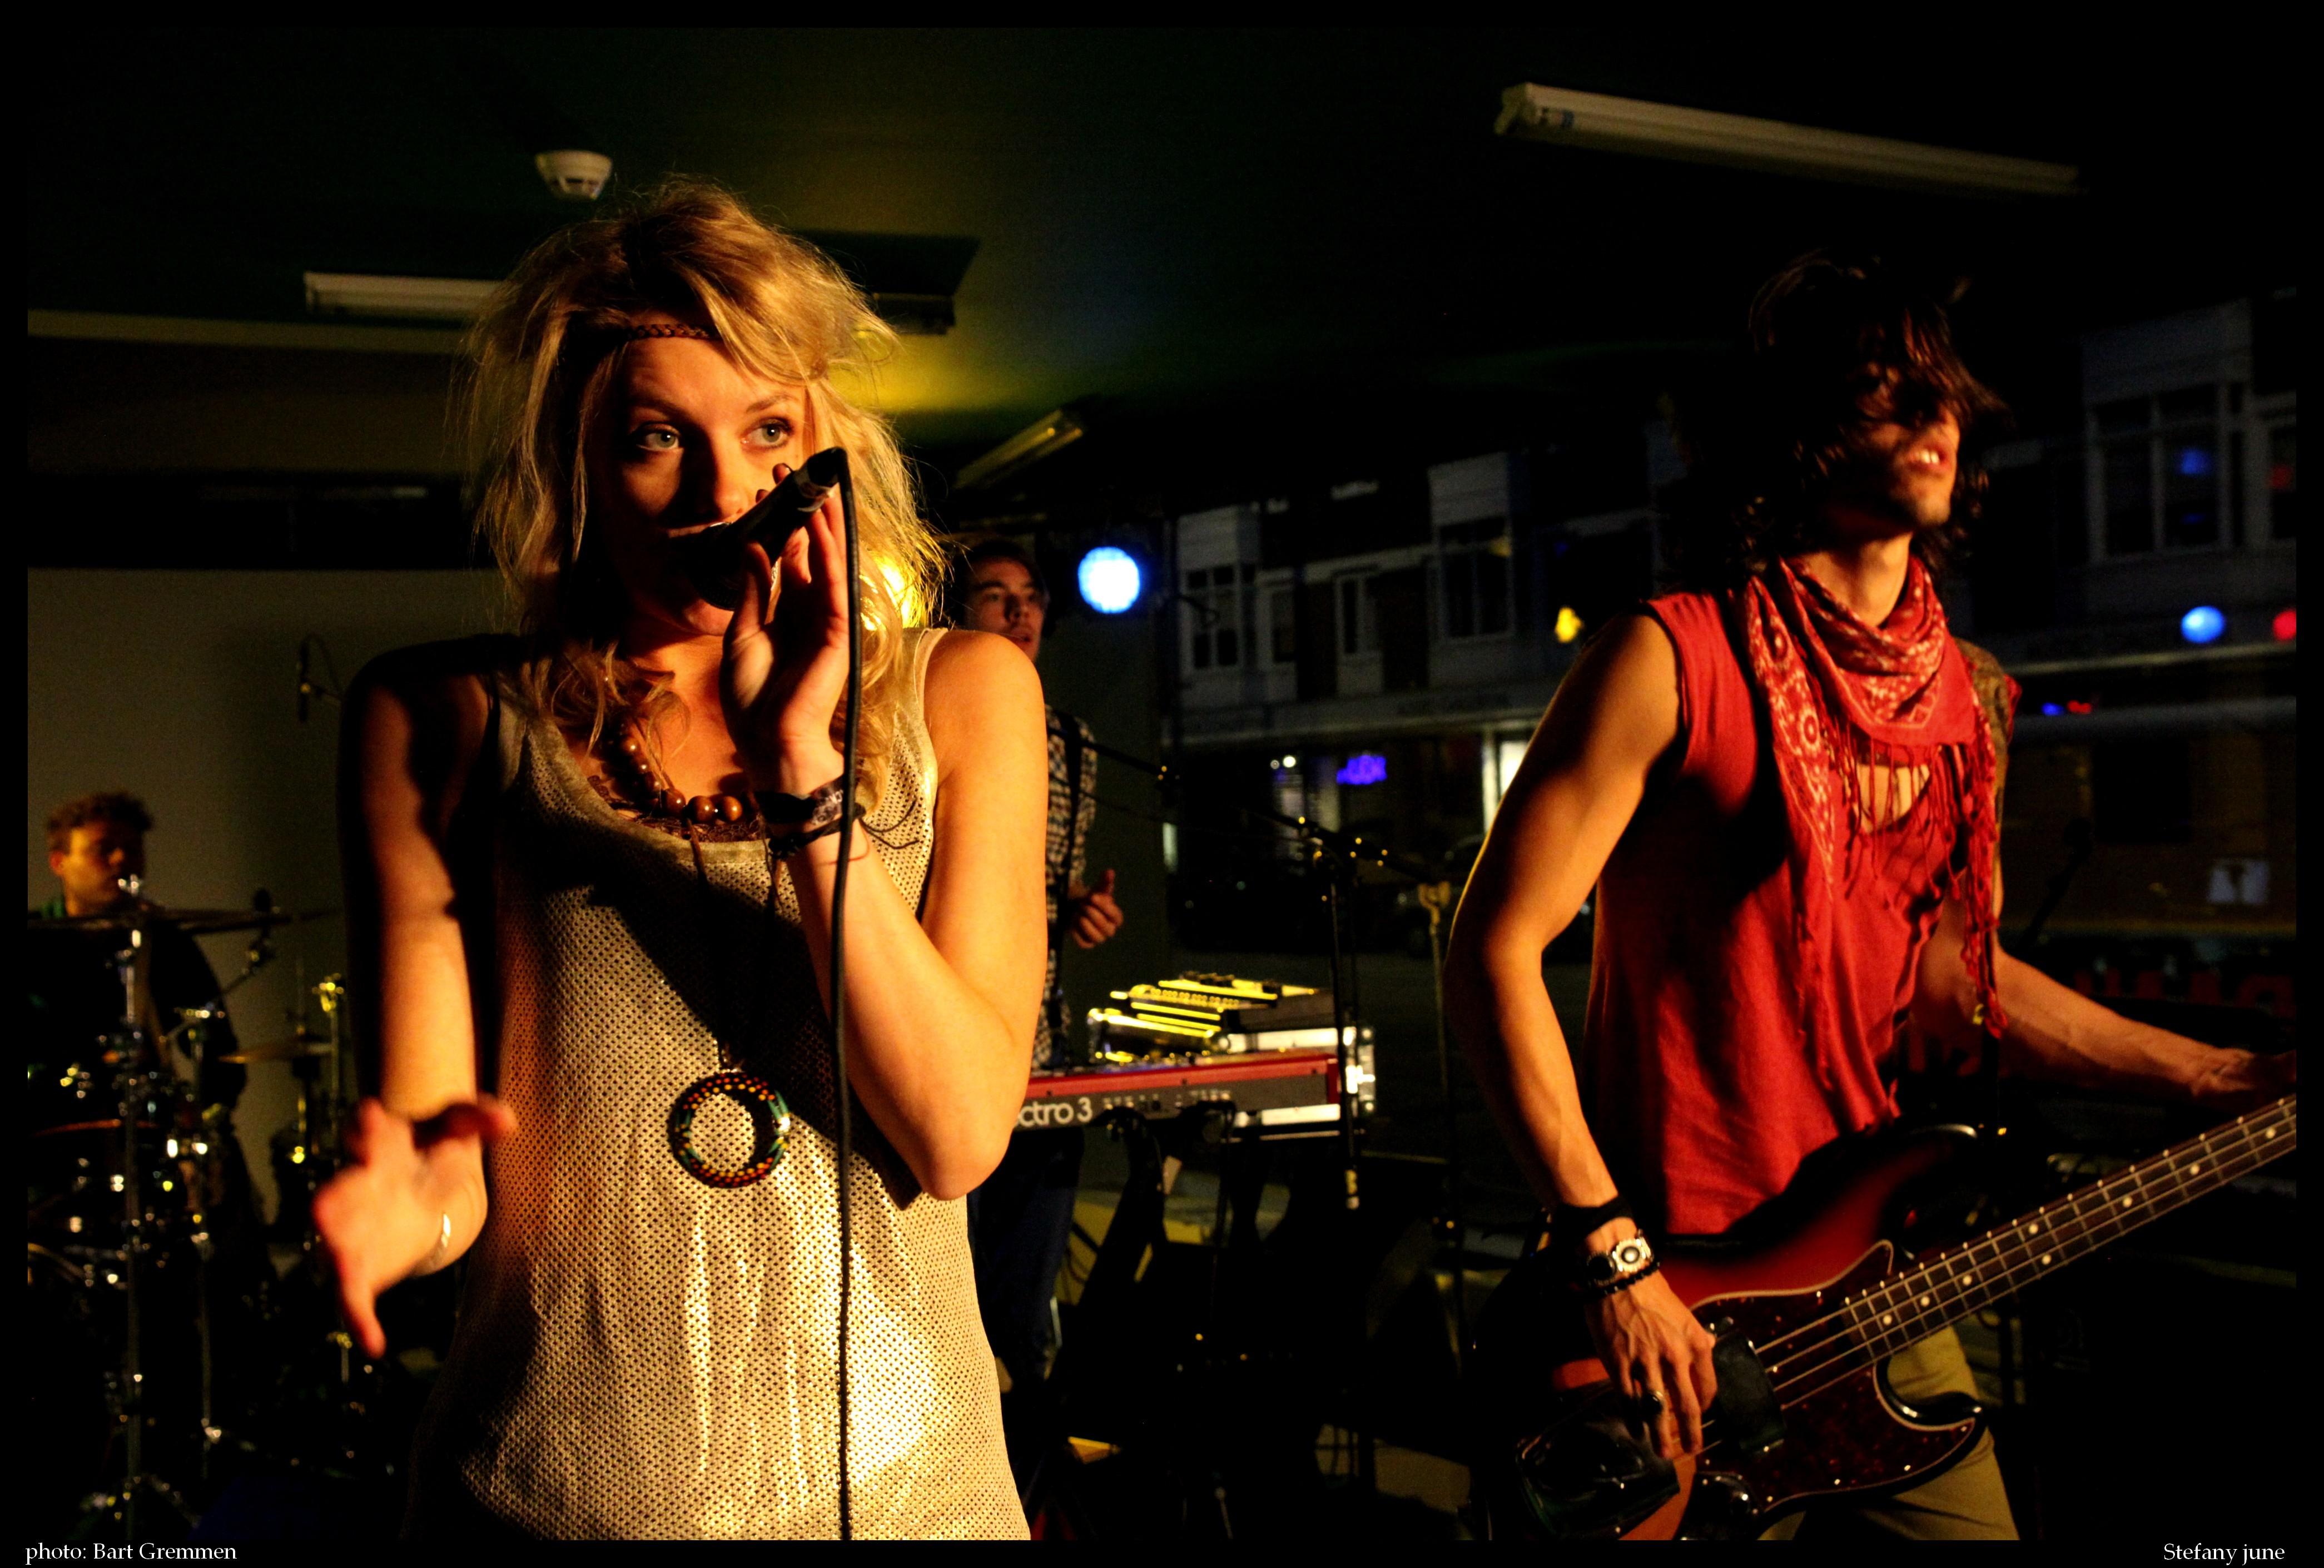 2011 - Bart Gremmen (Stefanie June)